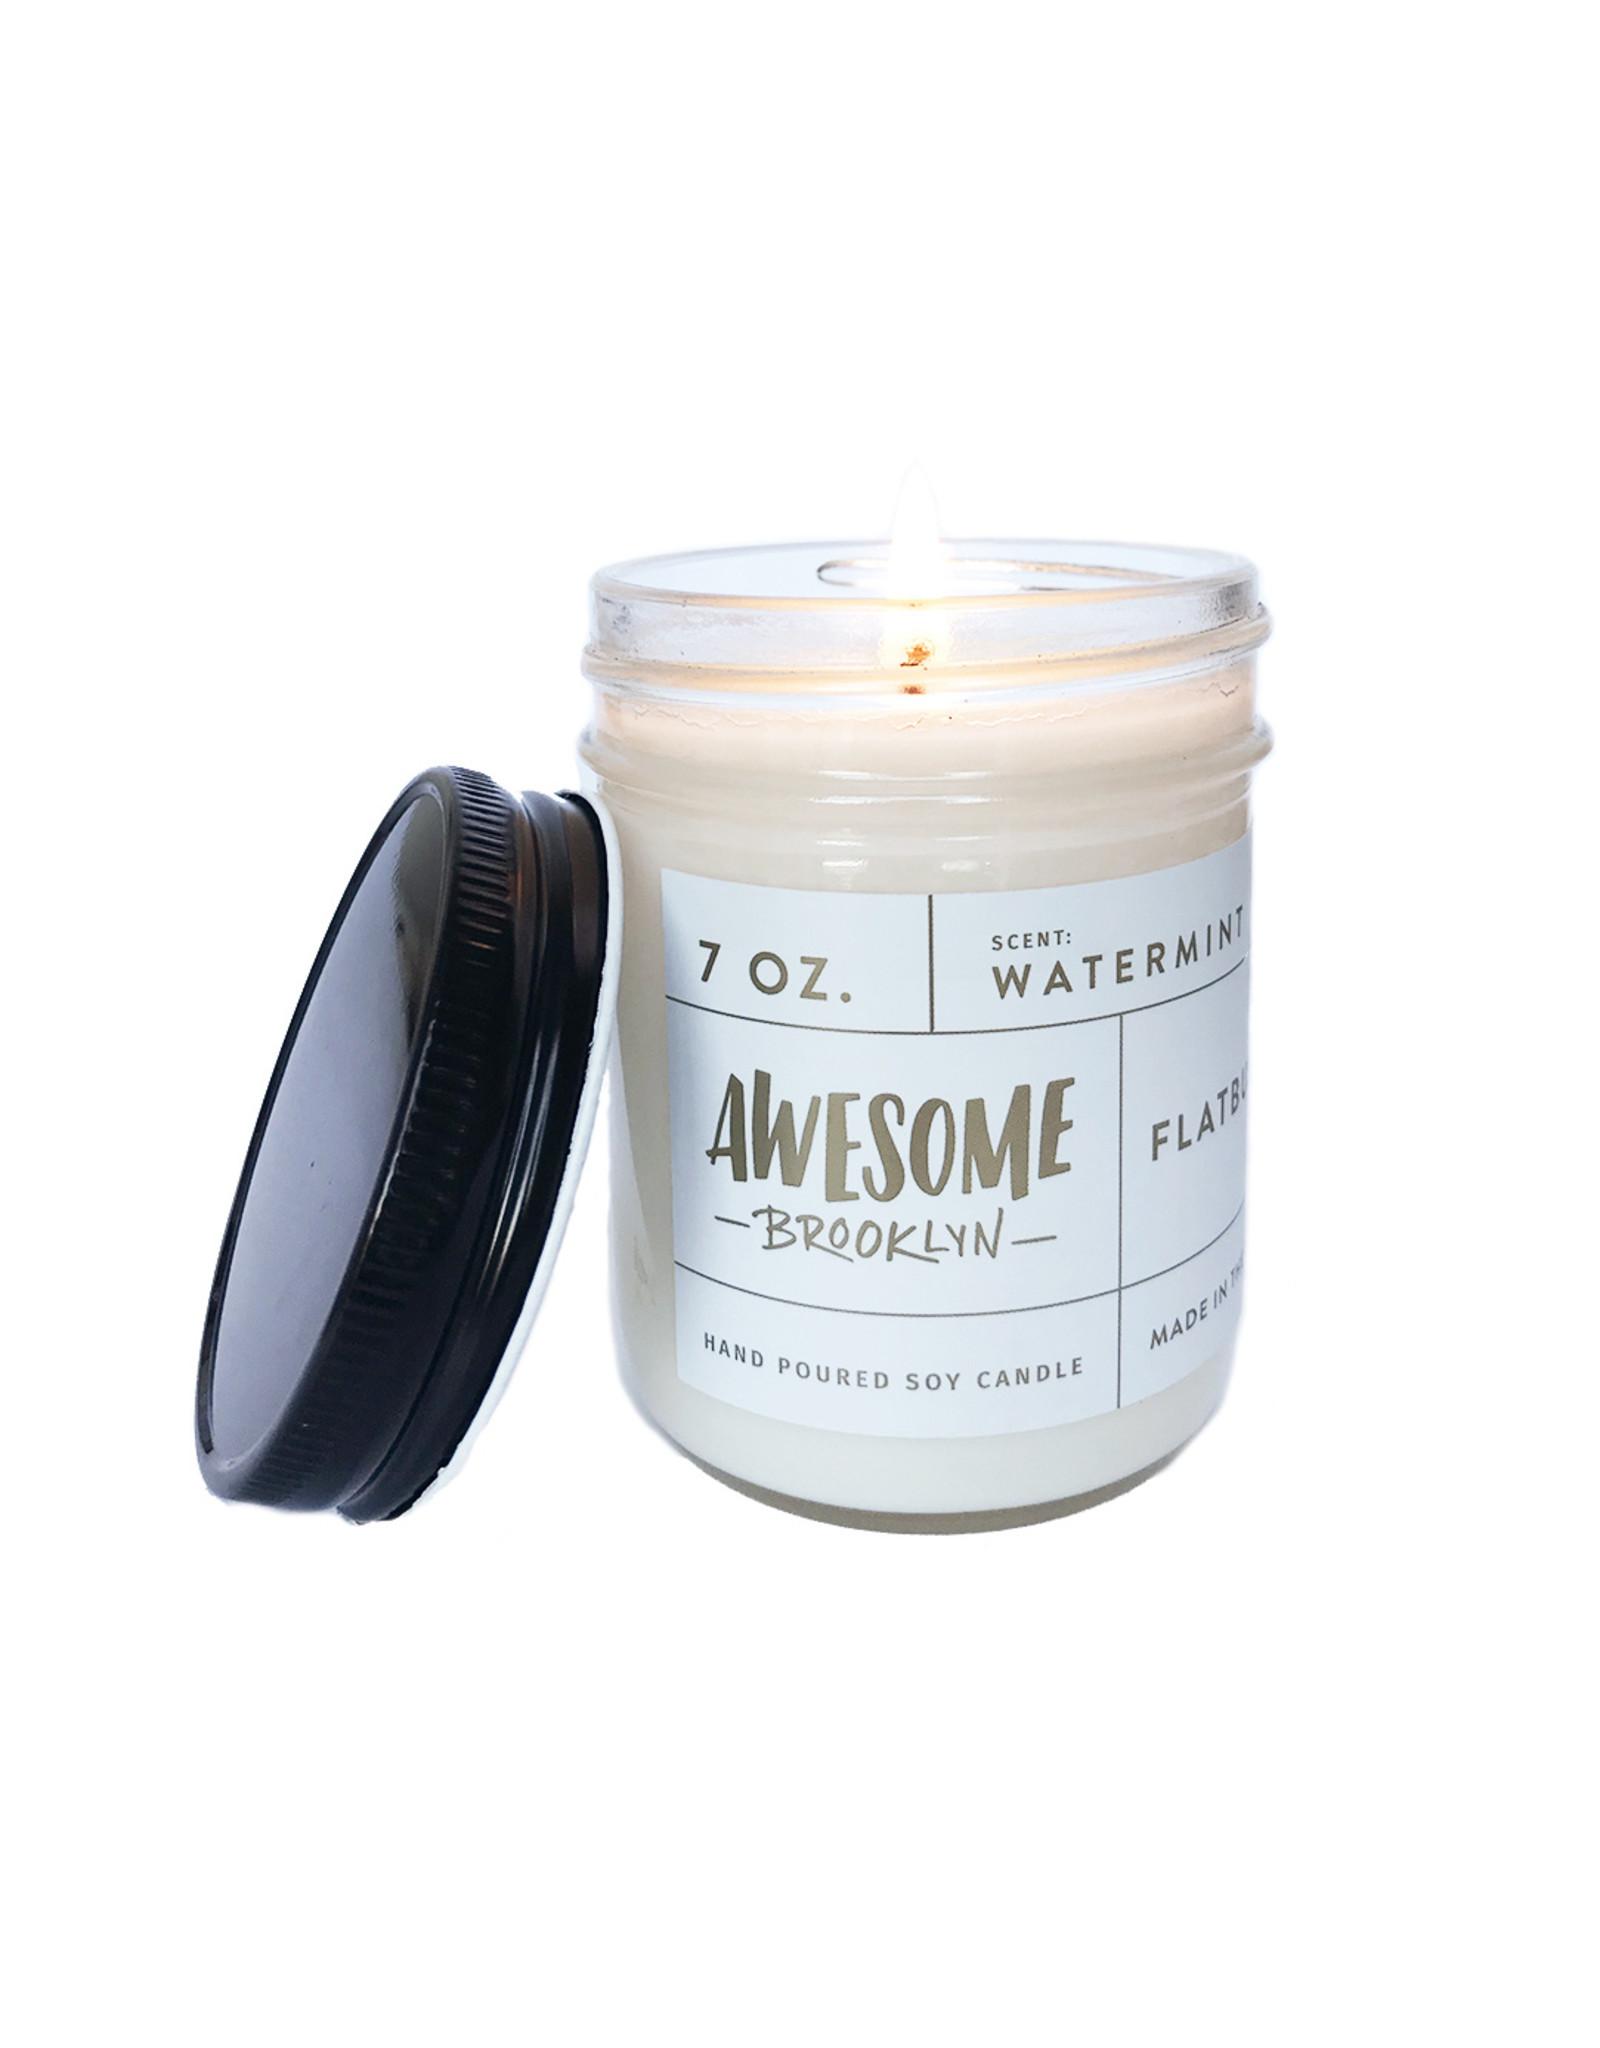 Greenmarket Purveying Company Awesome 7oz glass jar candle